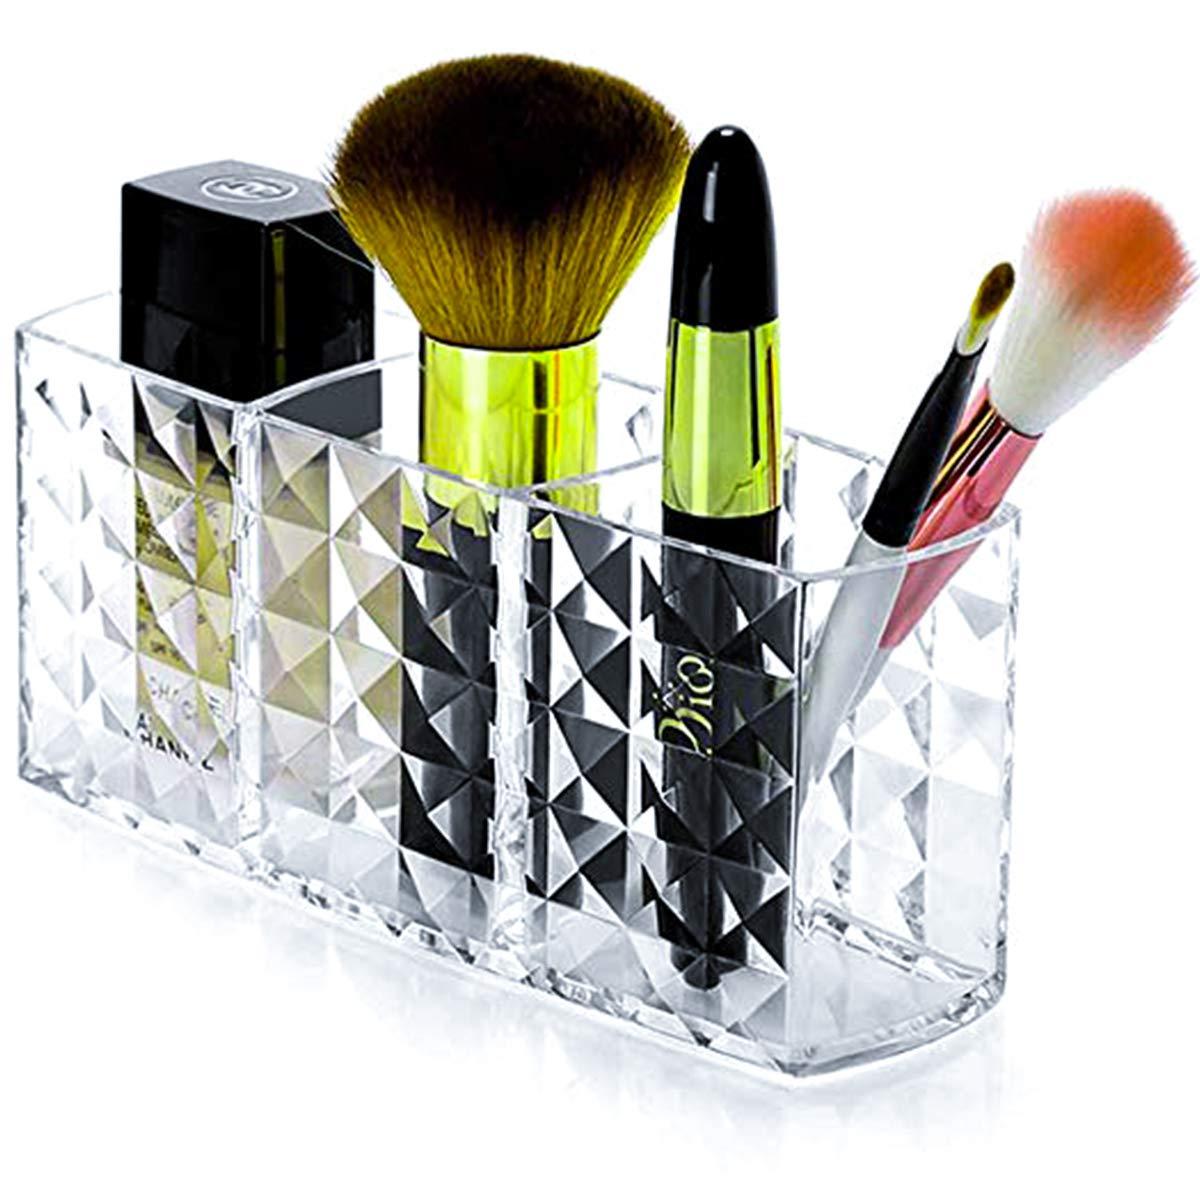 Tasybox Makeup Brush Holder Organizer, 3 Slot Acrylic Cosmetic Brushes Storage, Eyeliners Eyebrow Pencil Clear Diamond Shaped Display Case